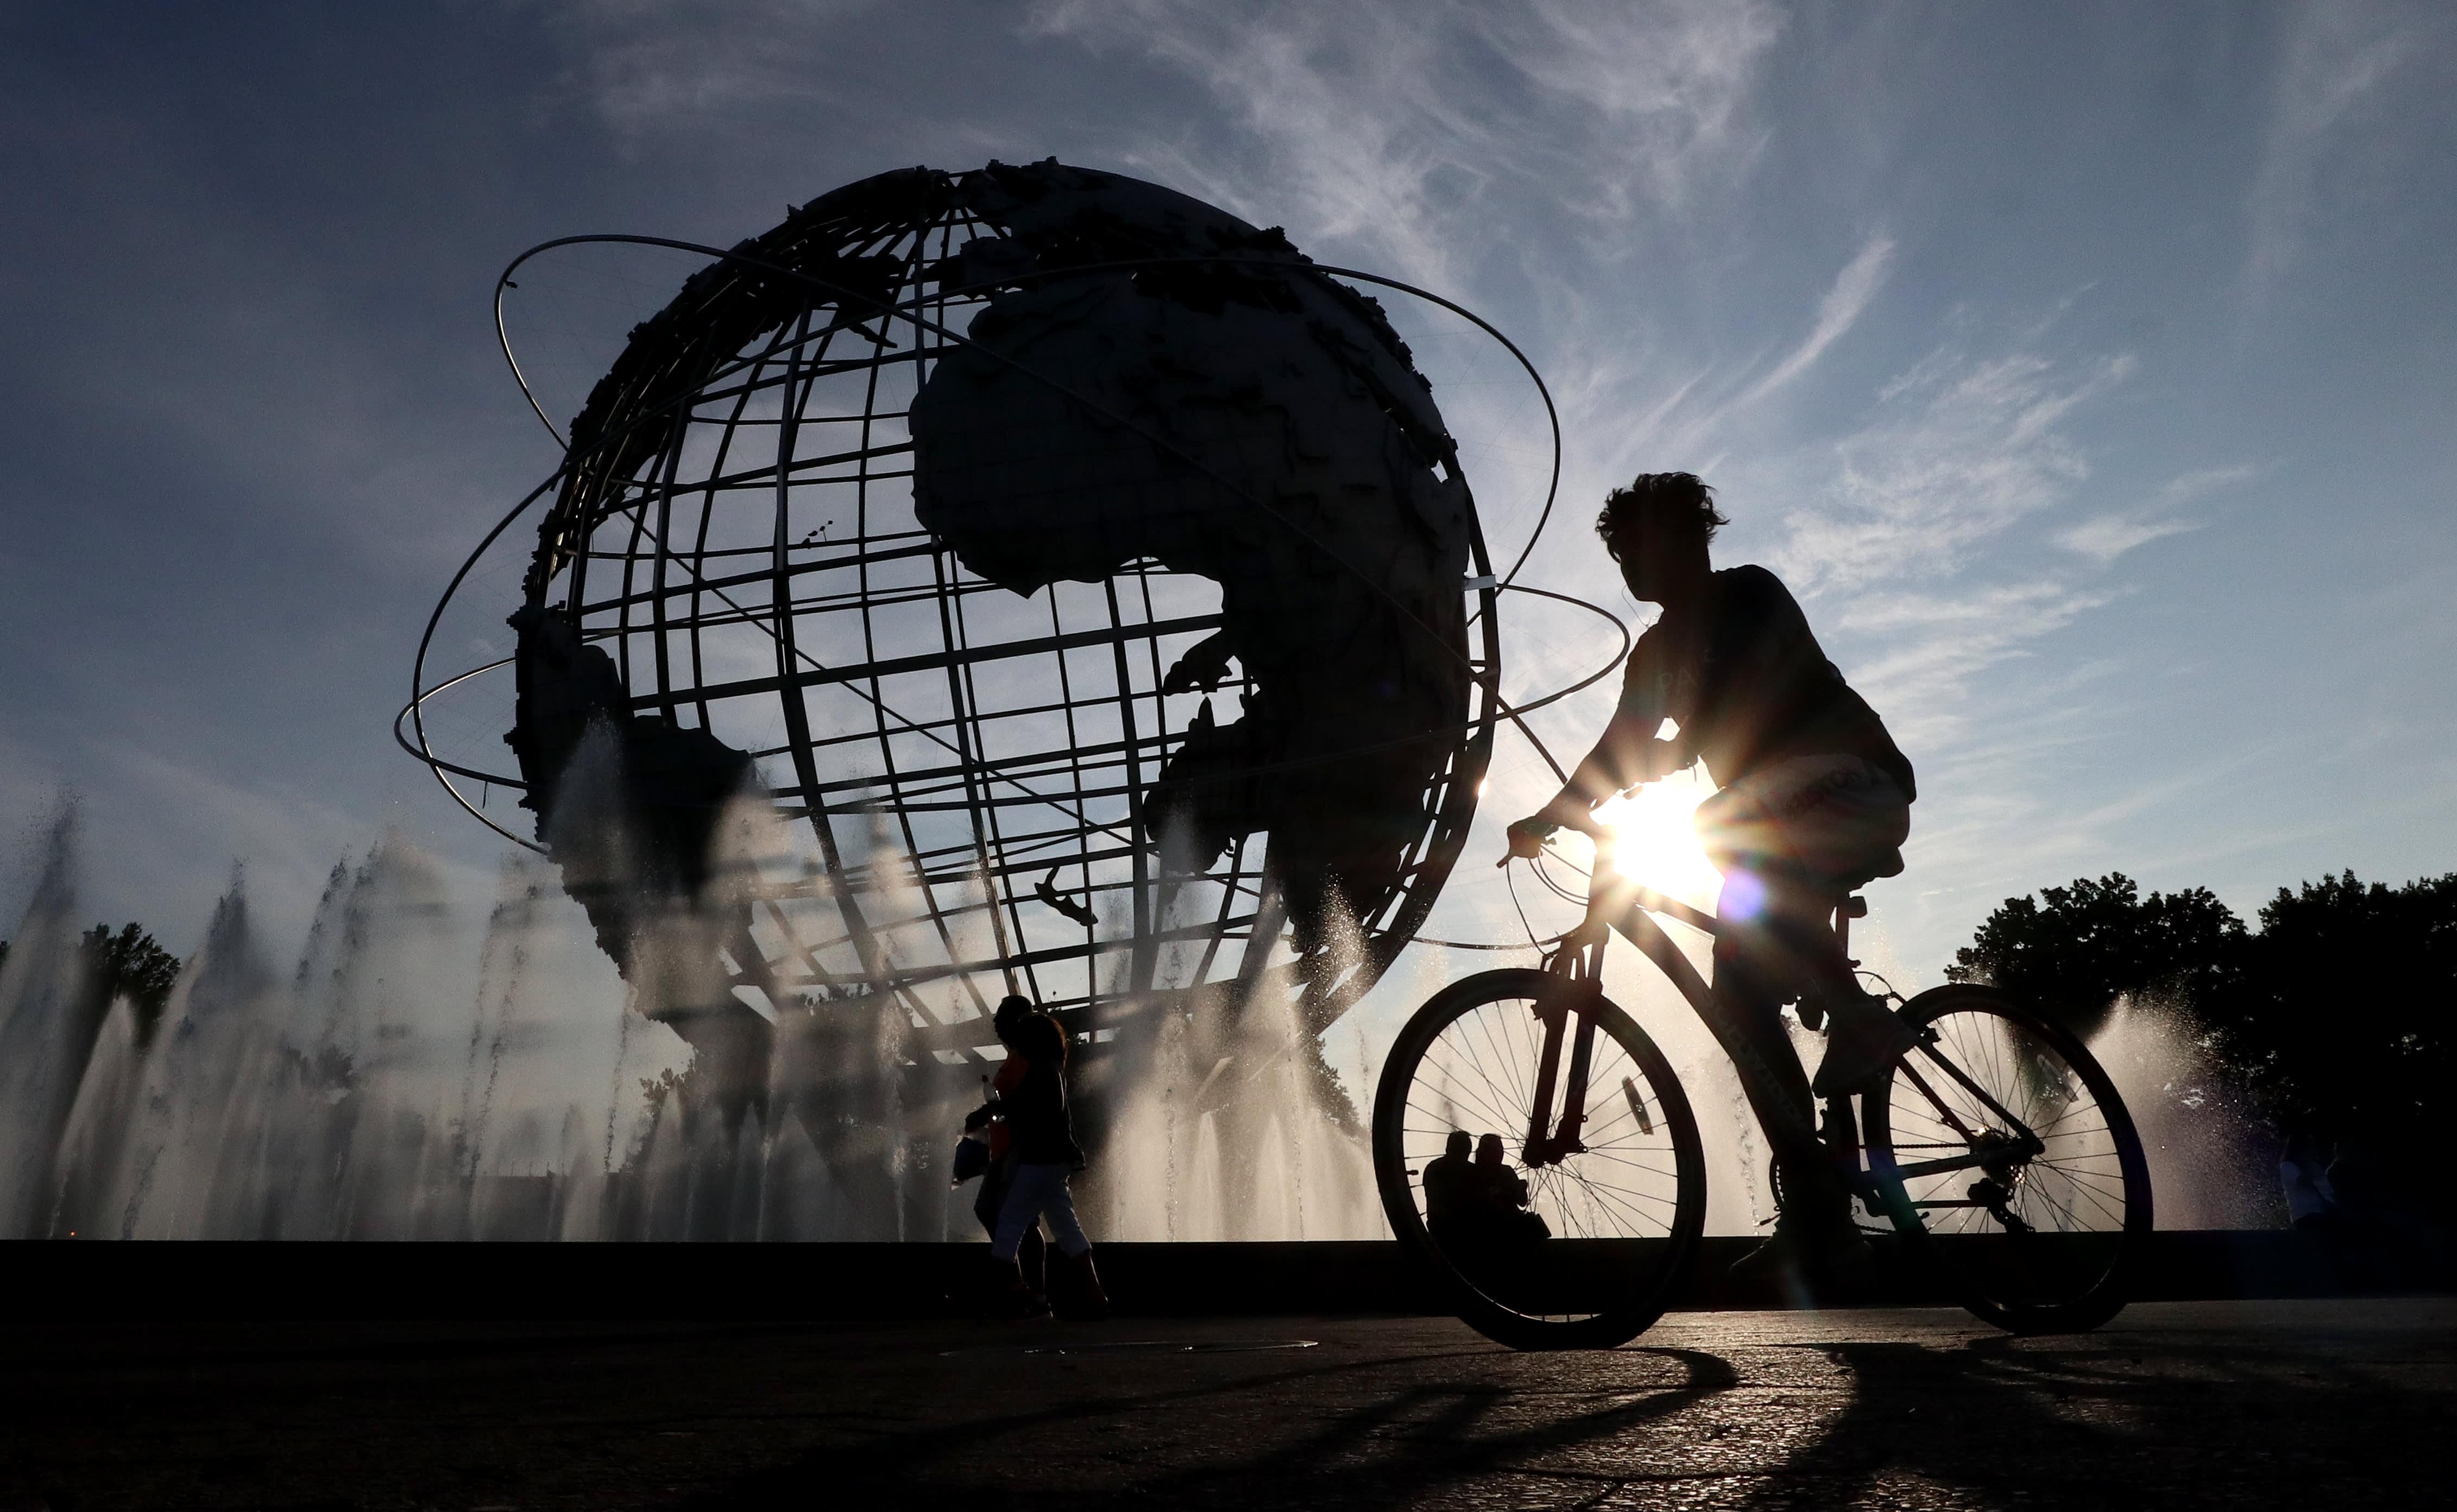 'major turning point' for responsible ESG investing, says JPMorgan